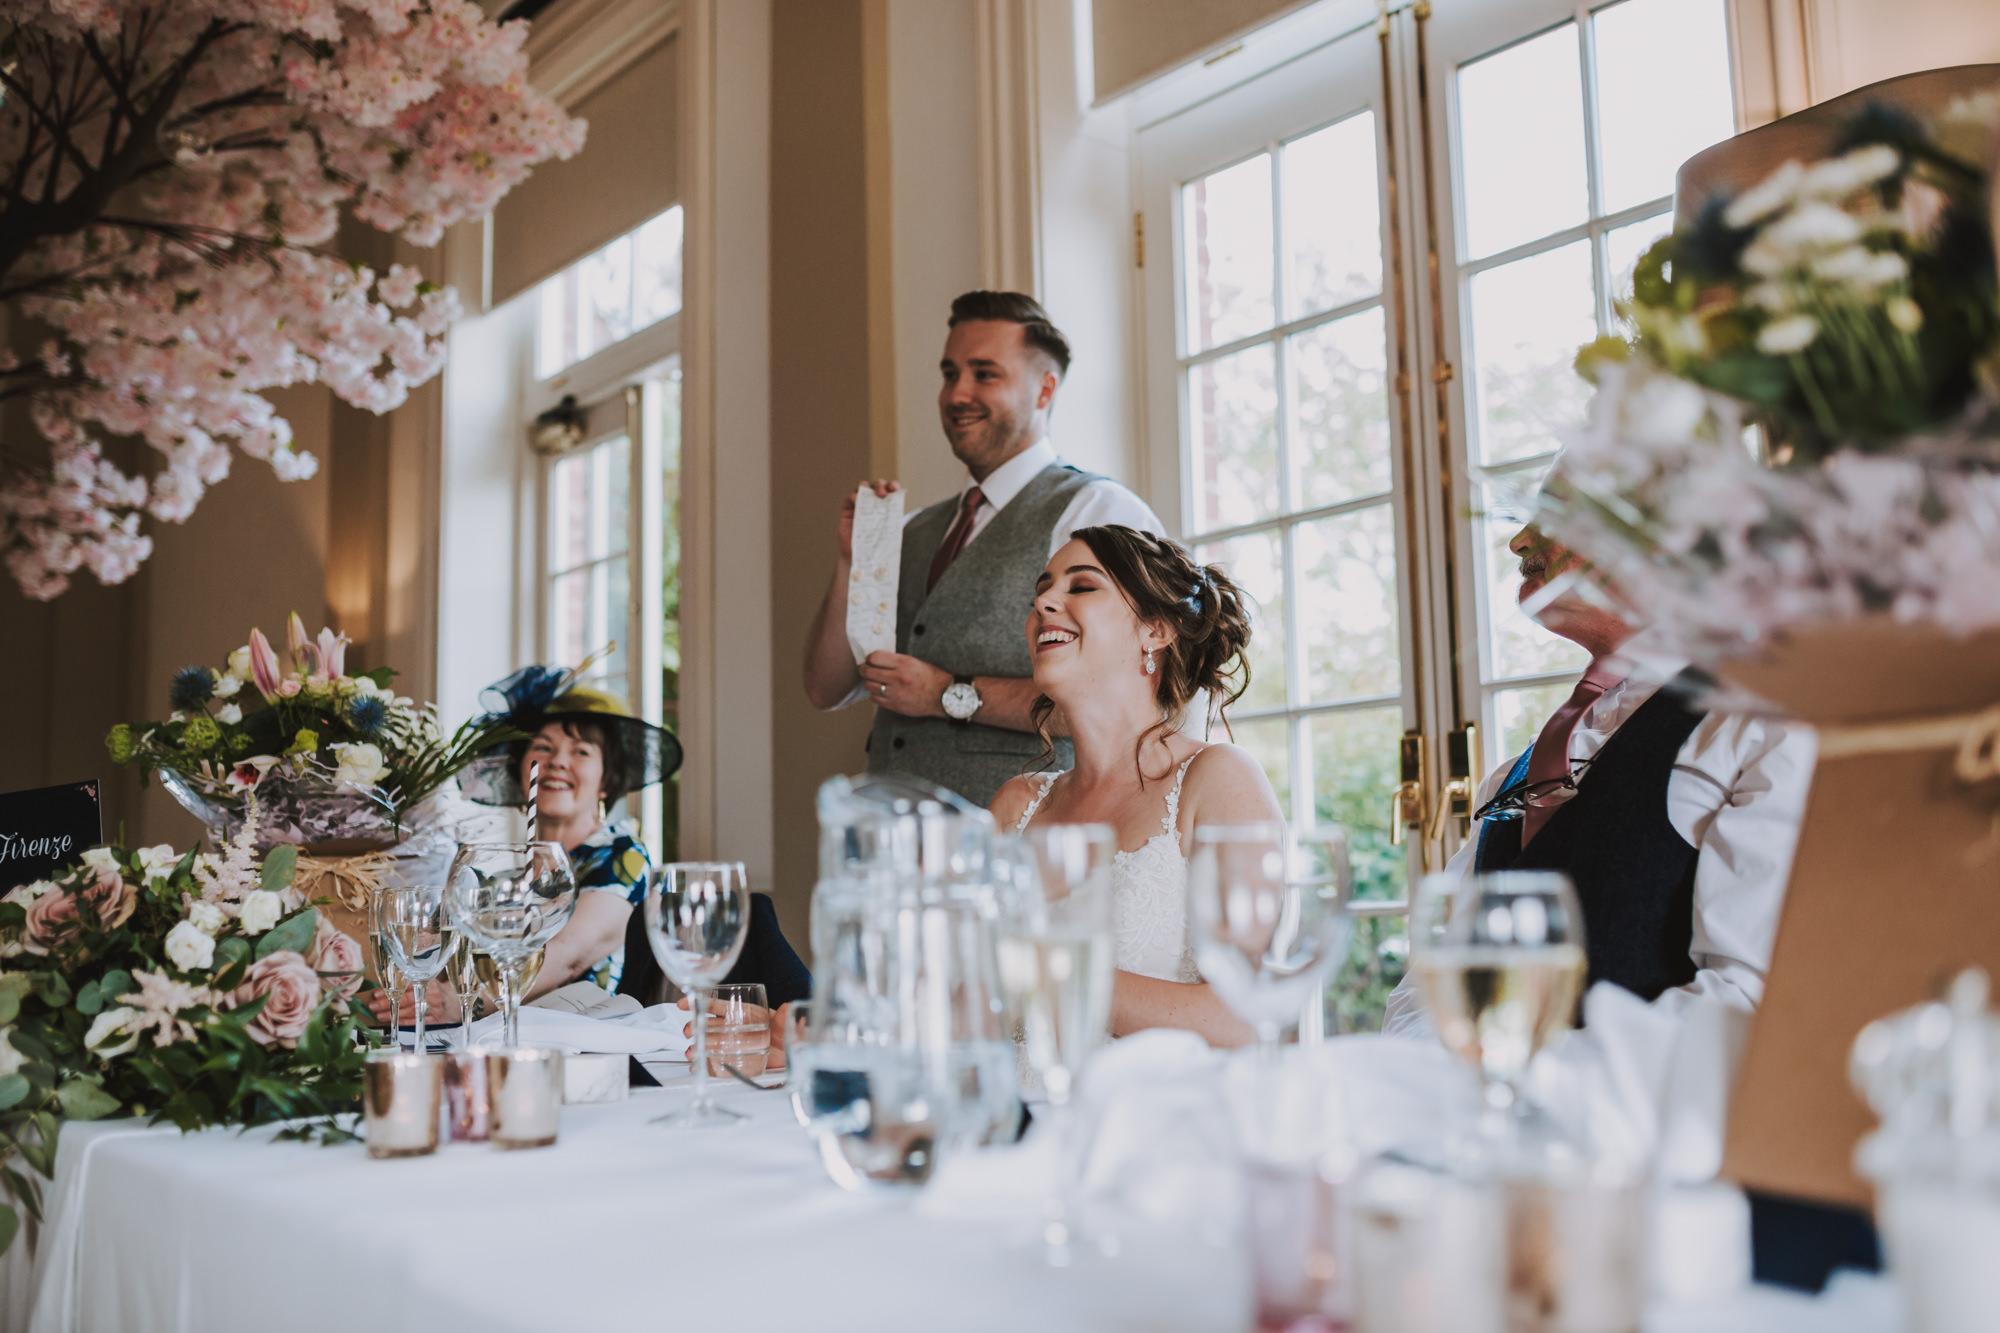 hodsock priory wedding photographers blog78.jpg